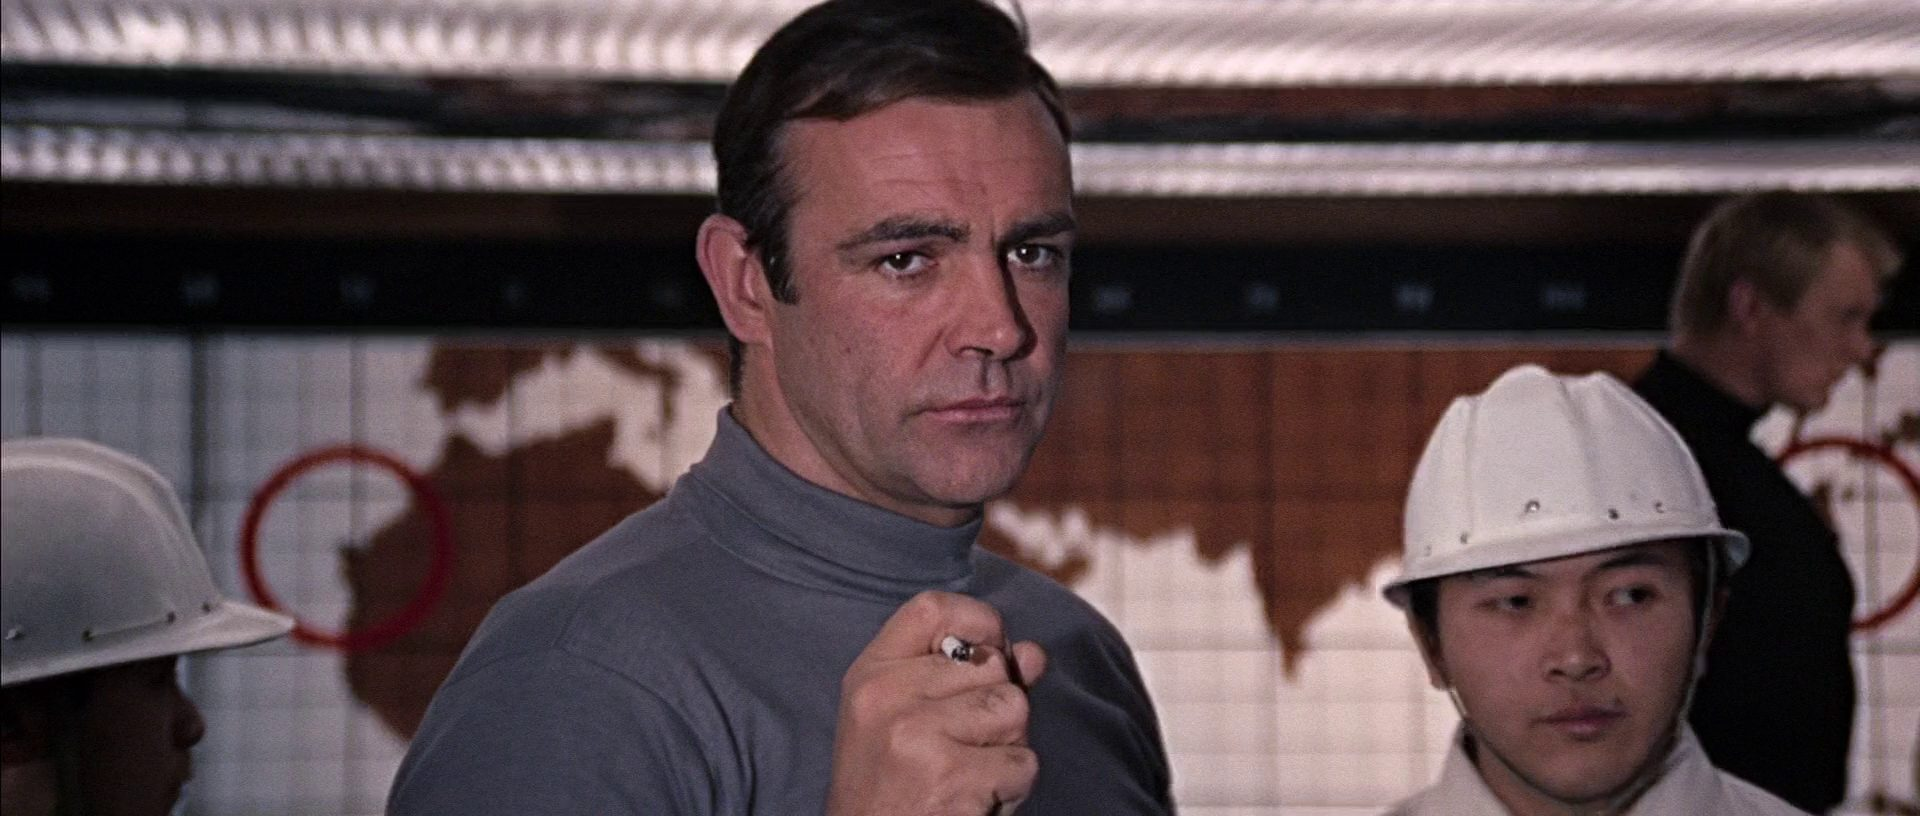 Filmszene aus James Bond 007 - Man lebt nur zweimal